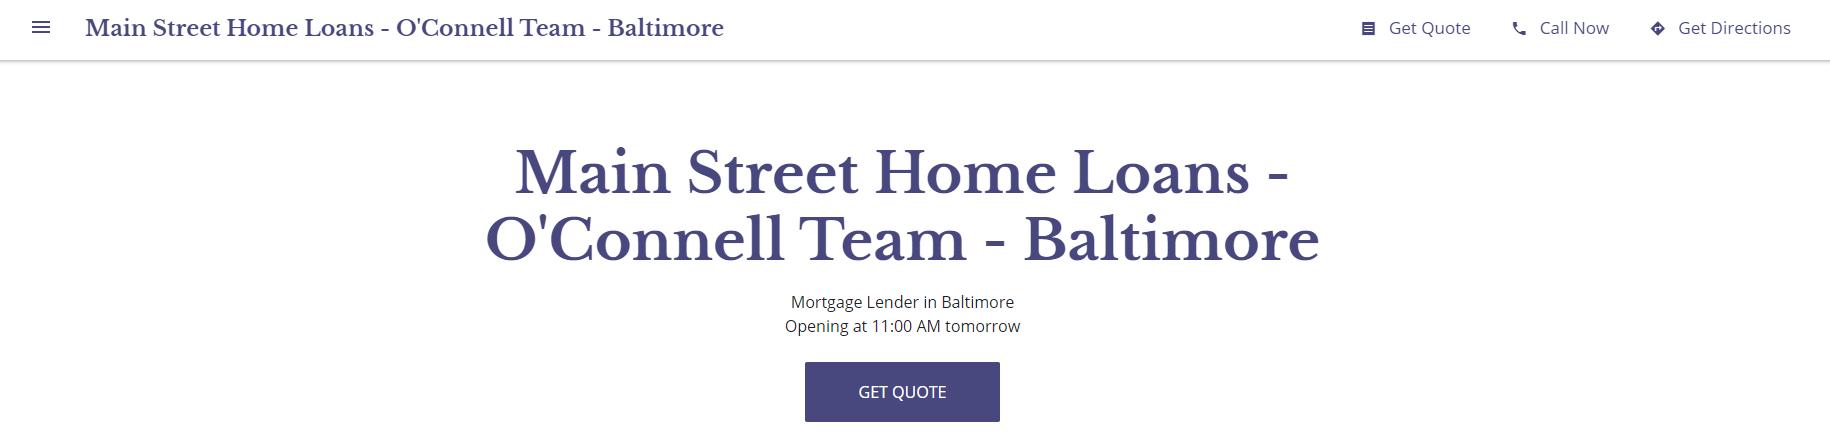 Main Street Home Loans